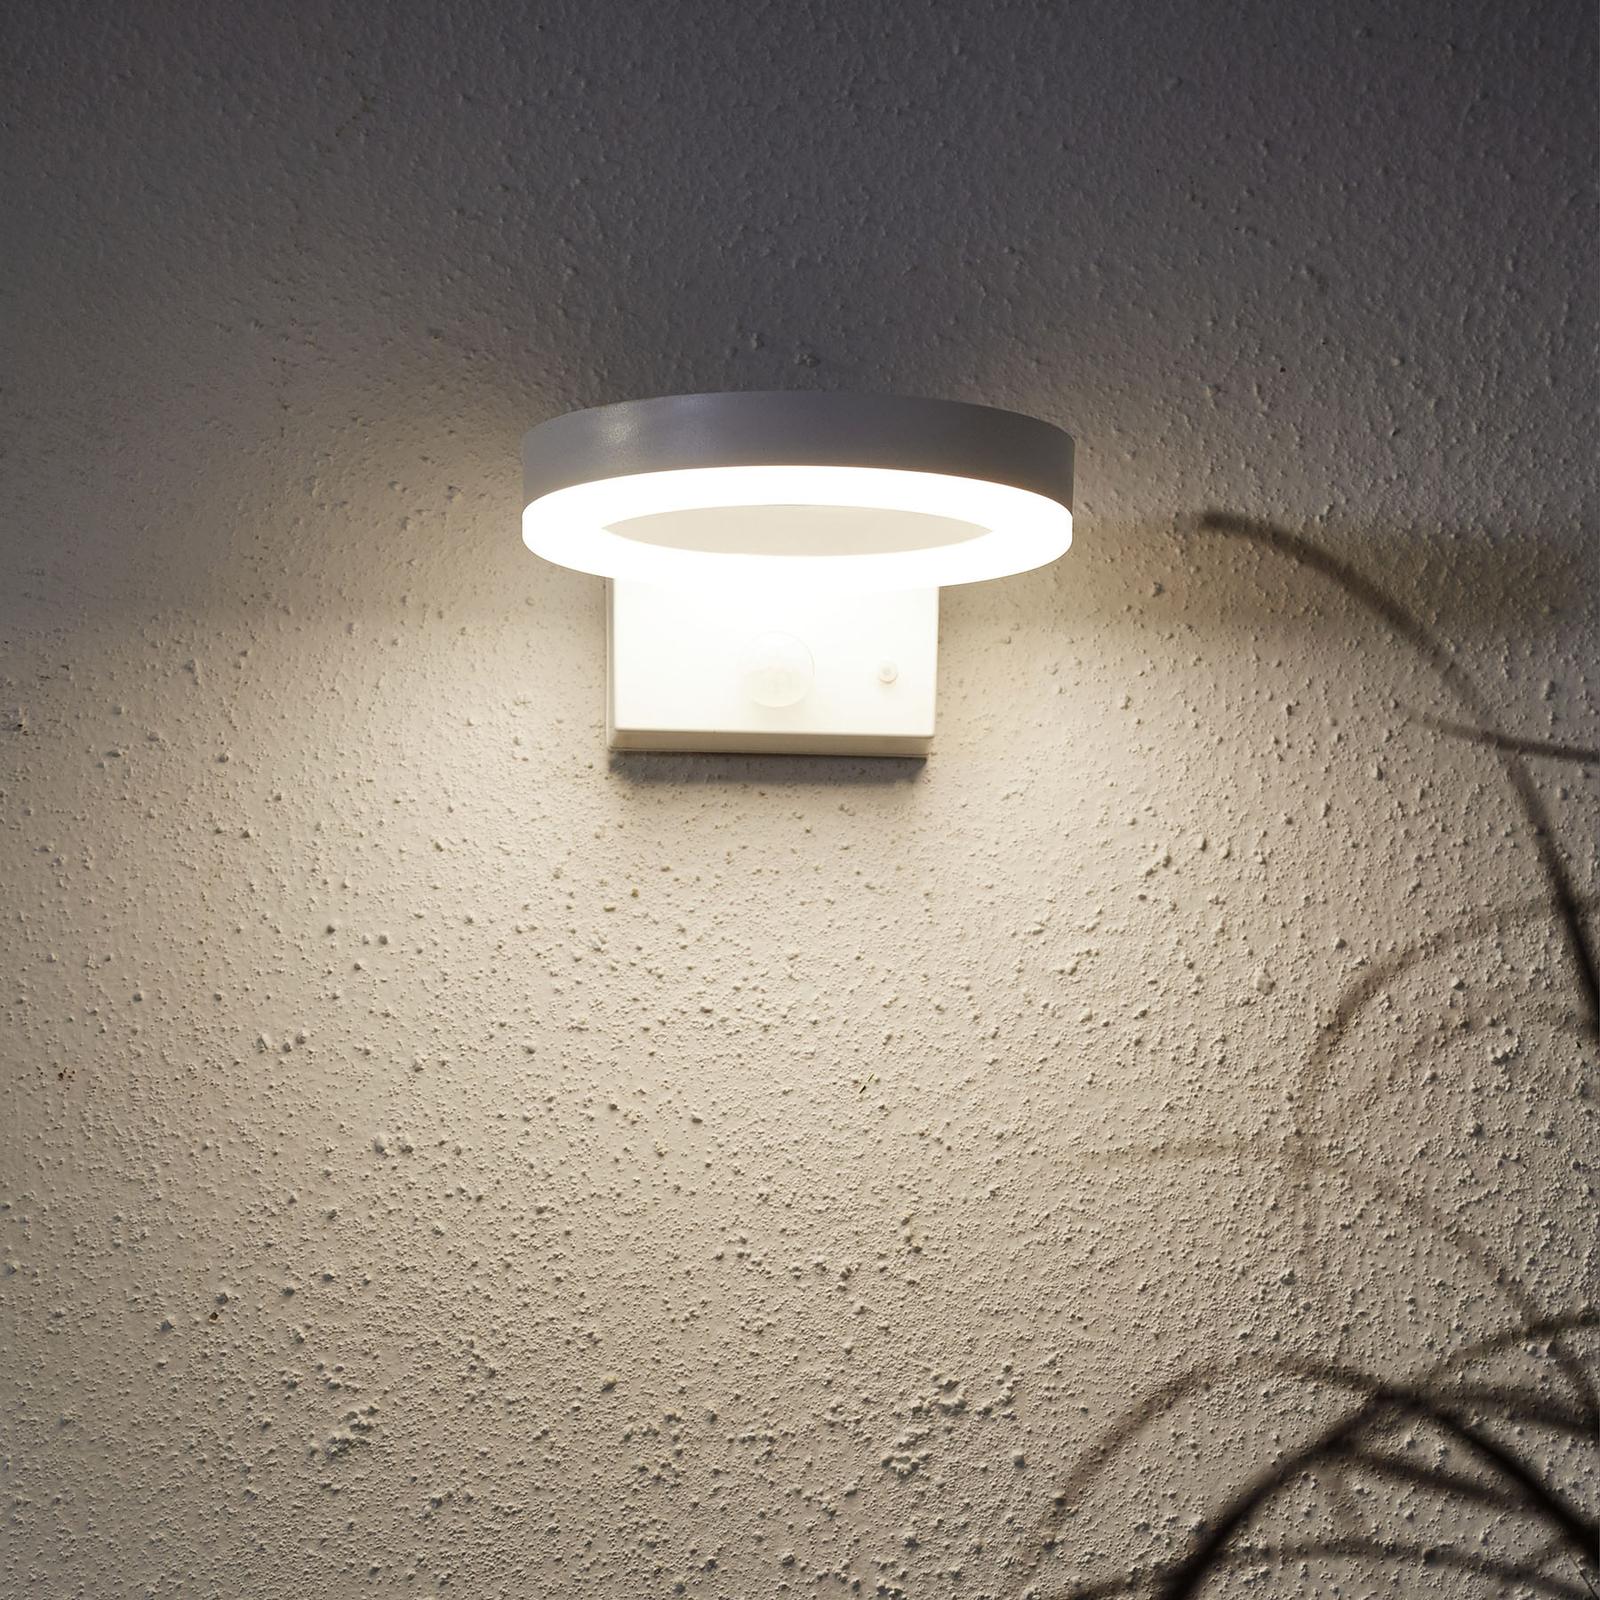 Solarna lampa ścienna LED Vidi z czujnikiem ruchu